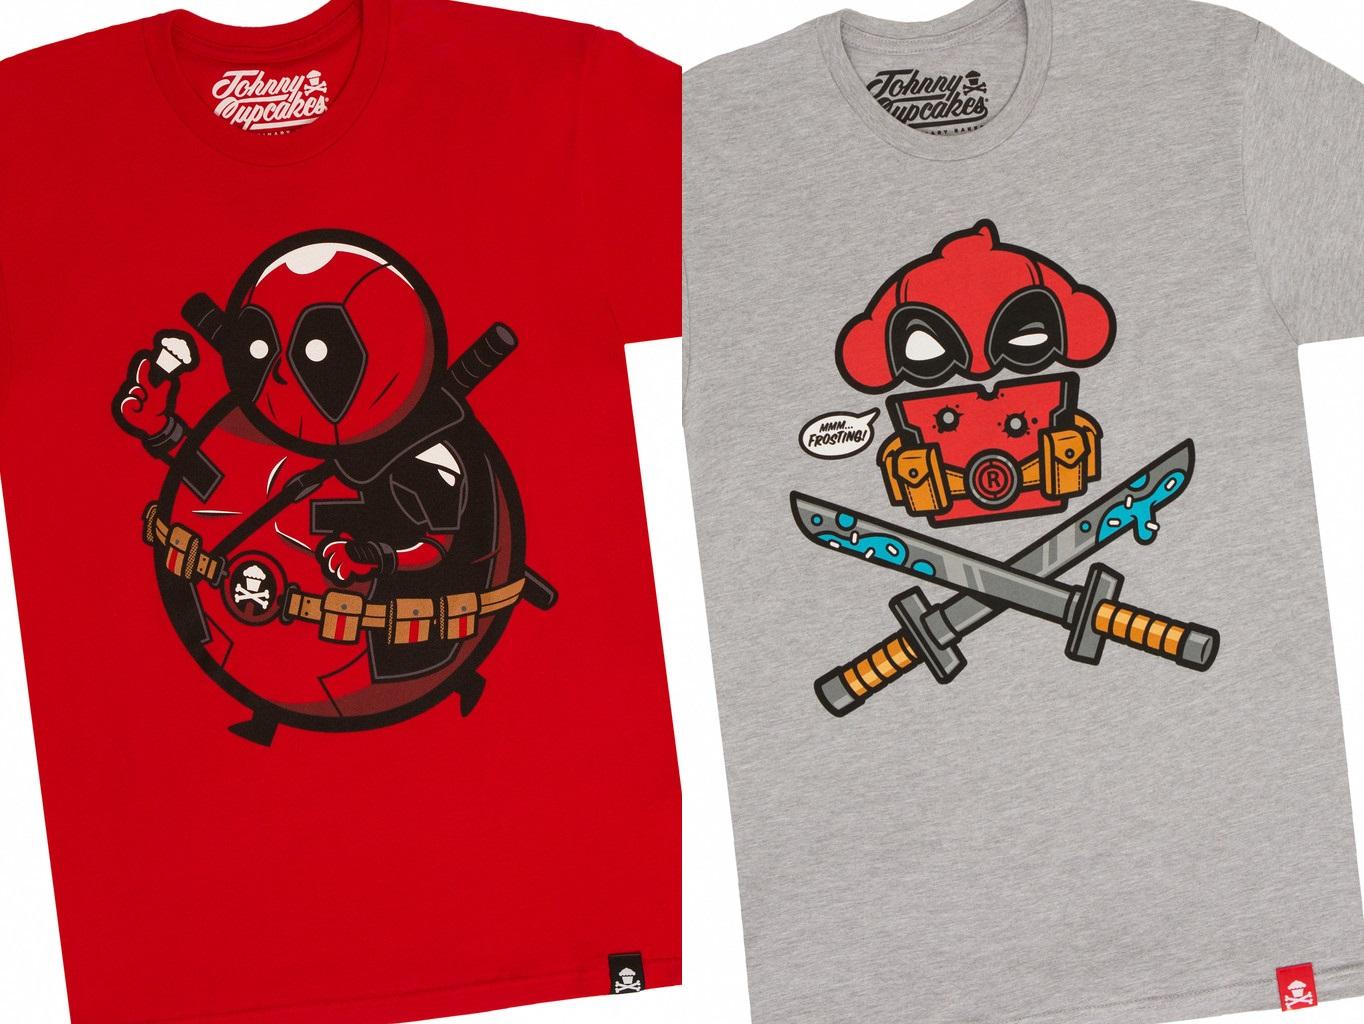 428d3d279c0 The Blot Says...  Deadpool x Johnny Cupcakes T-Shirts